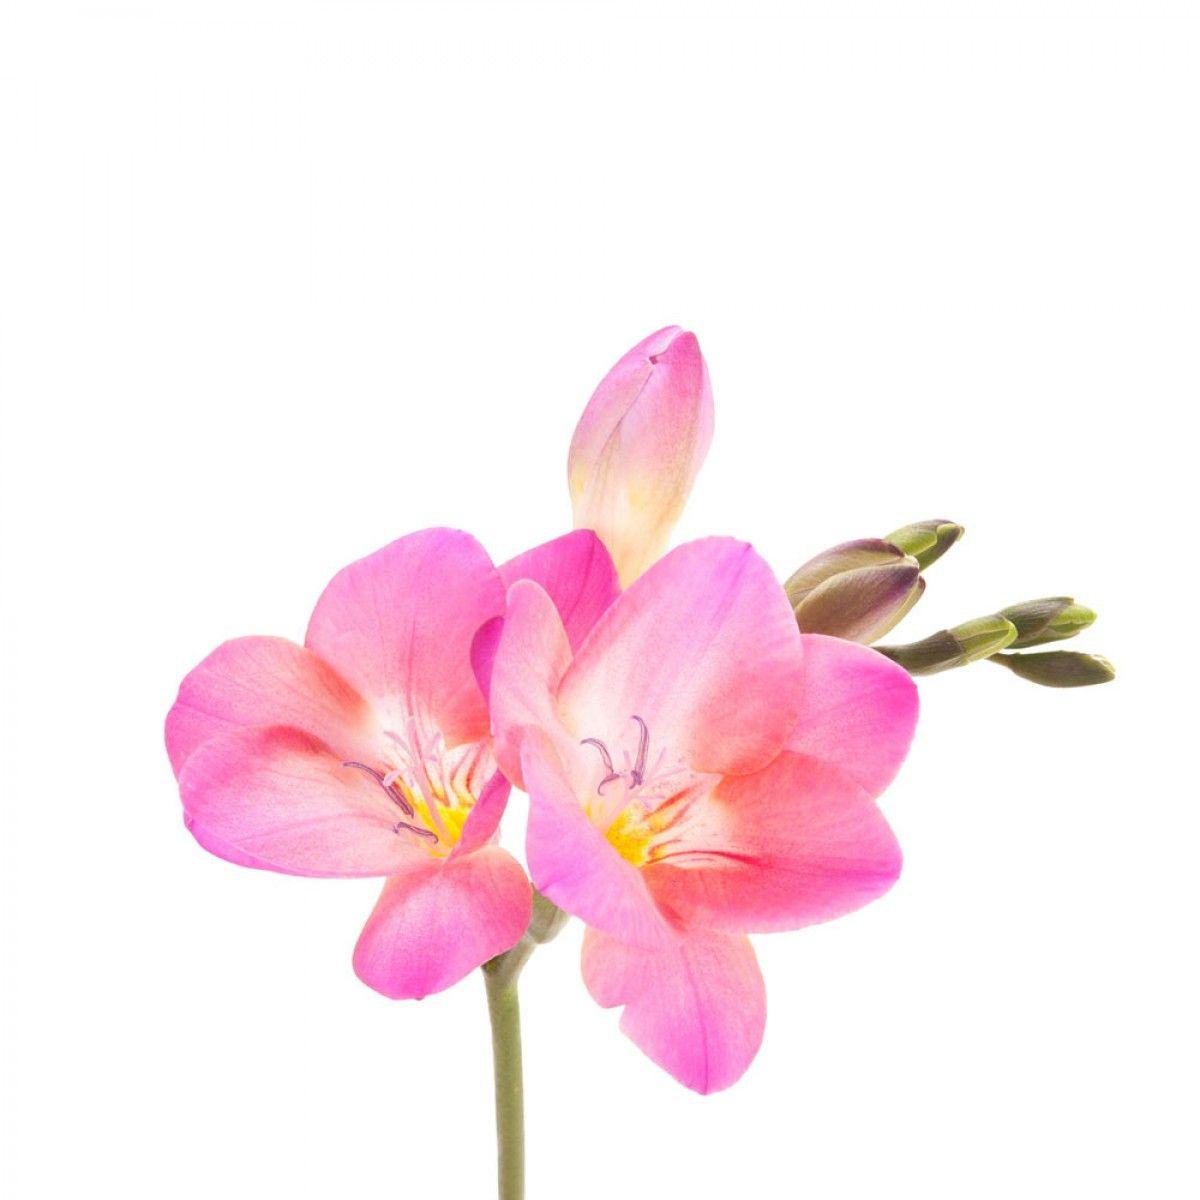 Pink Freesia Flower Muse Freesia Flowers Flower Painting Original Flower Painting